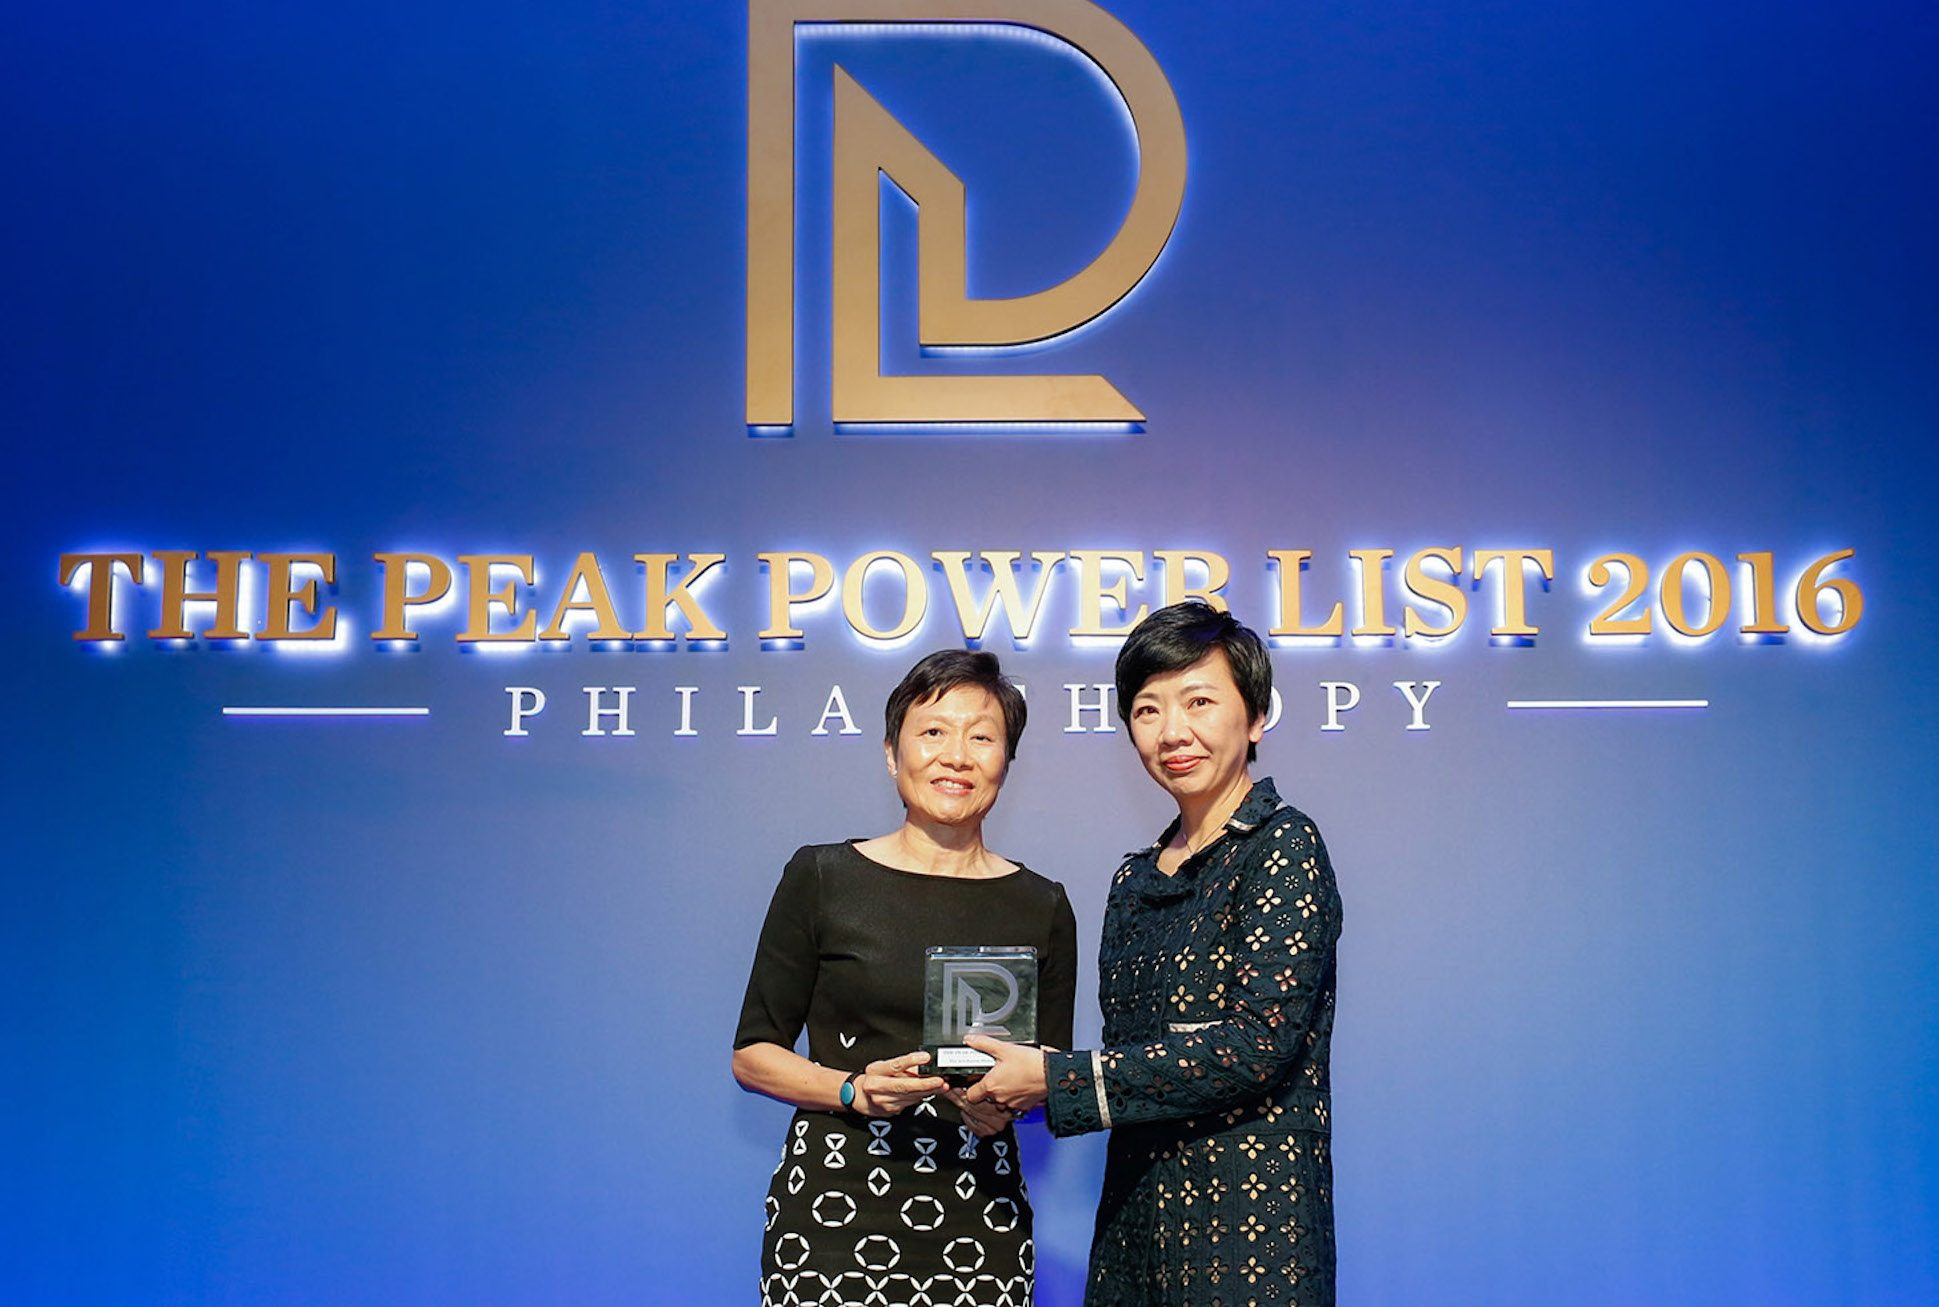 YFP on The Peak Power List 2016